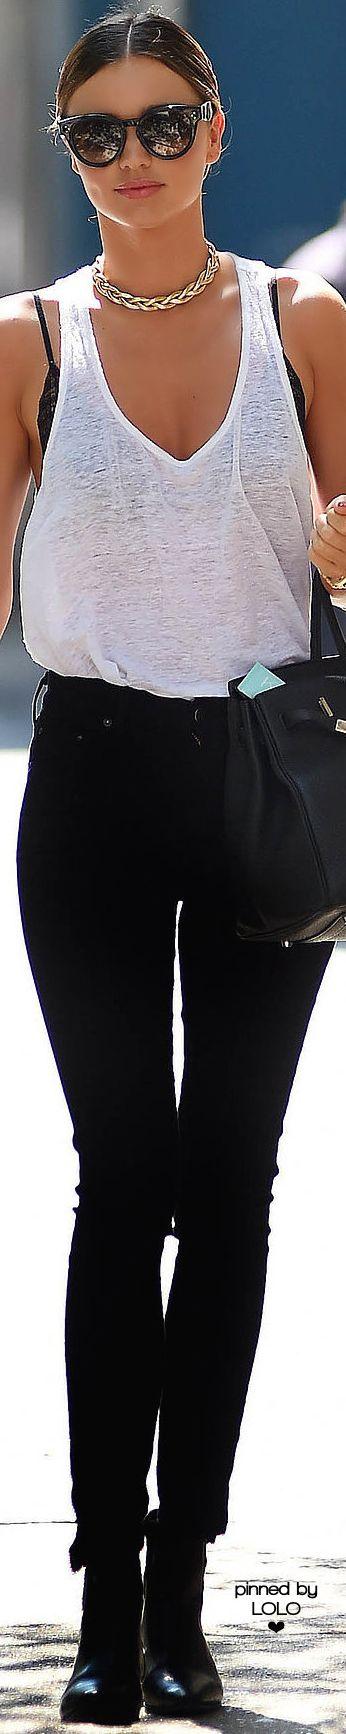 Miranda Kerr  • Street 'CHIC • ❤️ ✿ιиѕριяαтισи❀ #abbigliamento